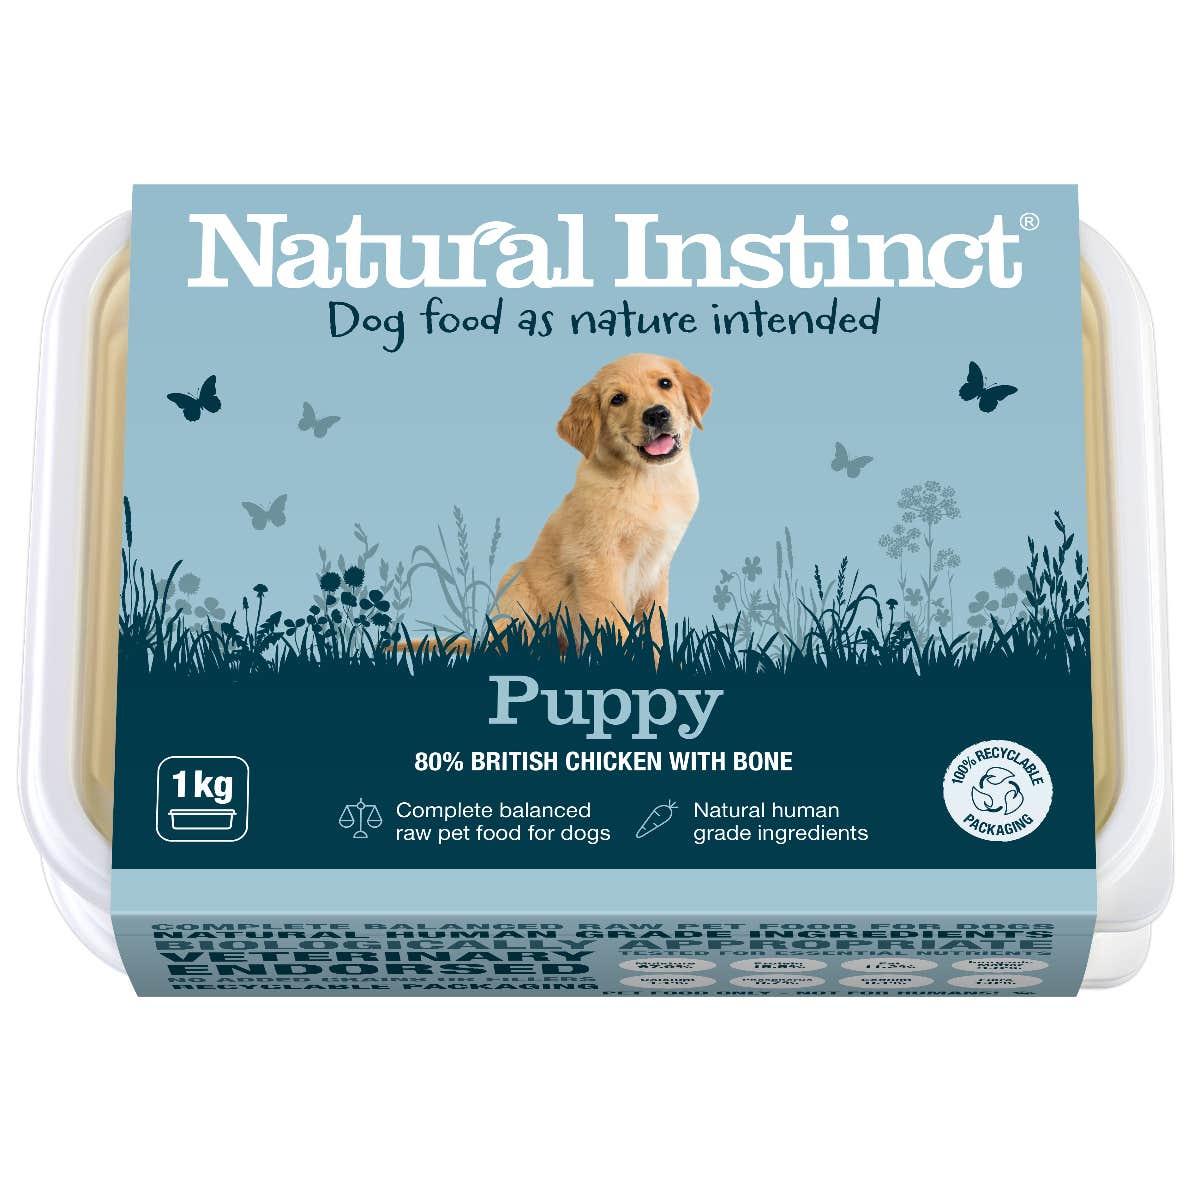 Natural Instinct Dog Food Puppy 1KG